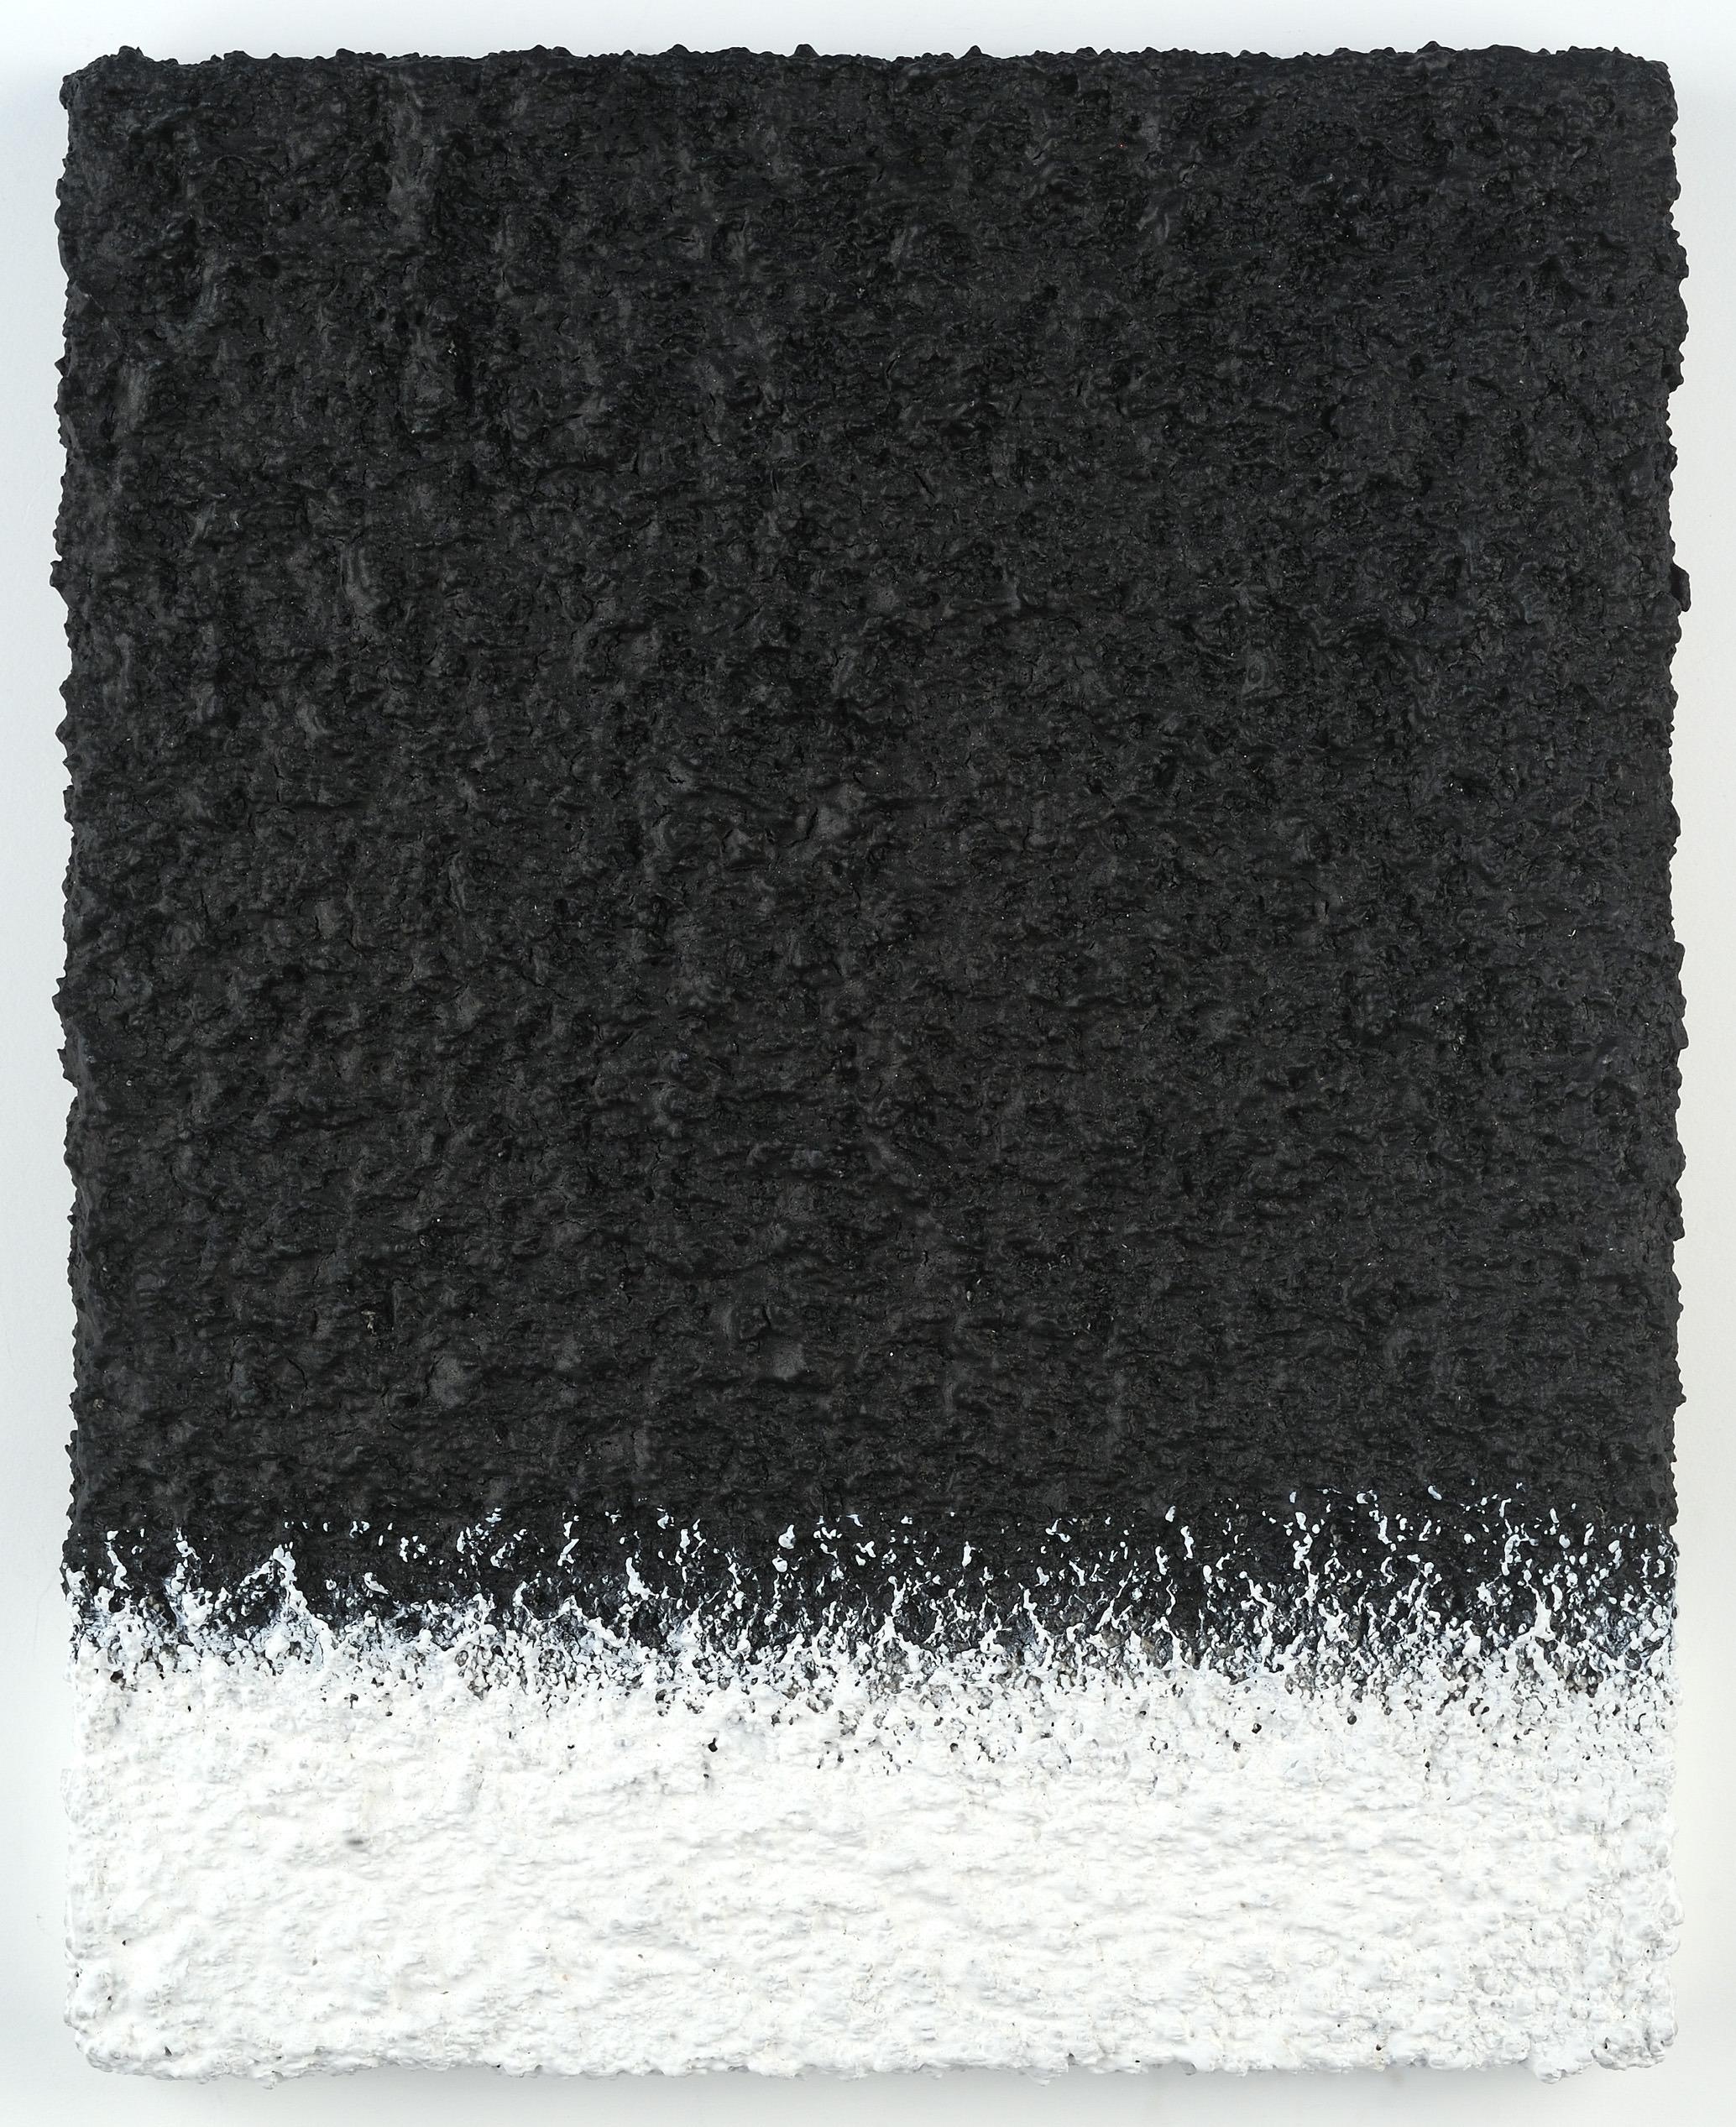 Drift 2_mixed media on wood panel_11x14 in_$600.jpg